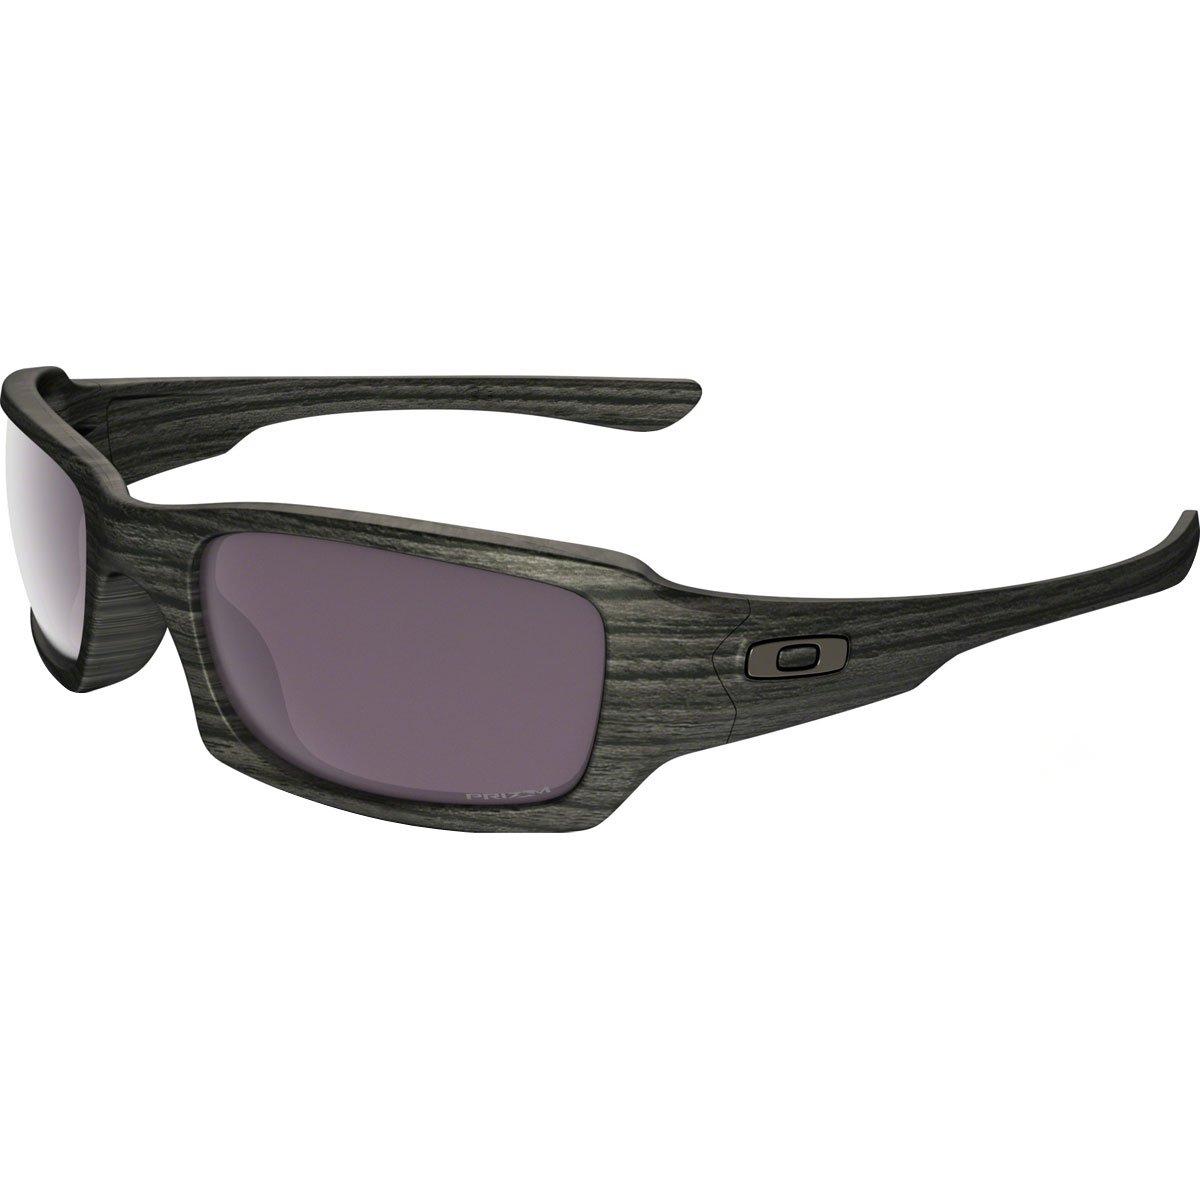 Oakley Men's Fives Squared Polarized Iridium Rectangular Sunglasses, Woodgrain, 54 mm